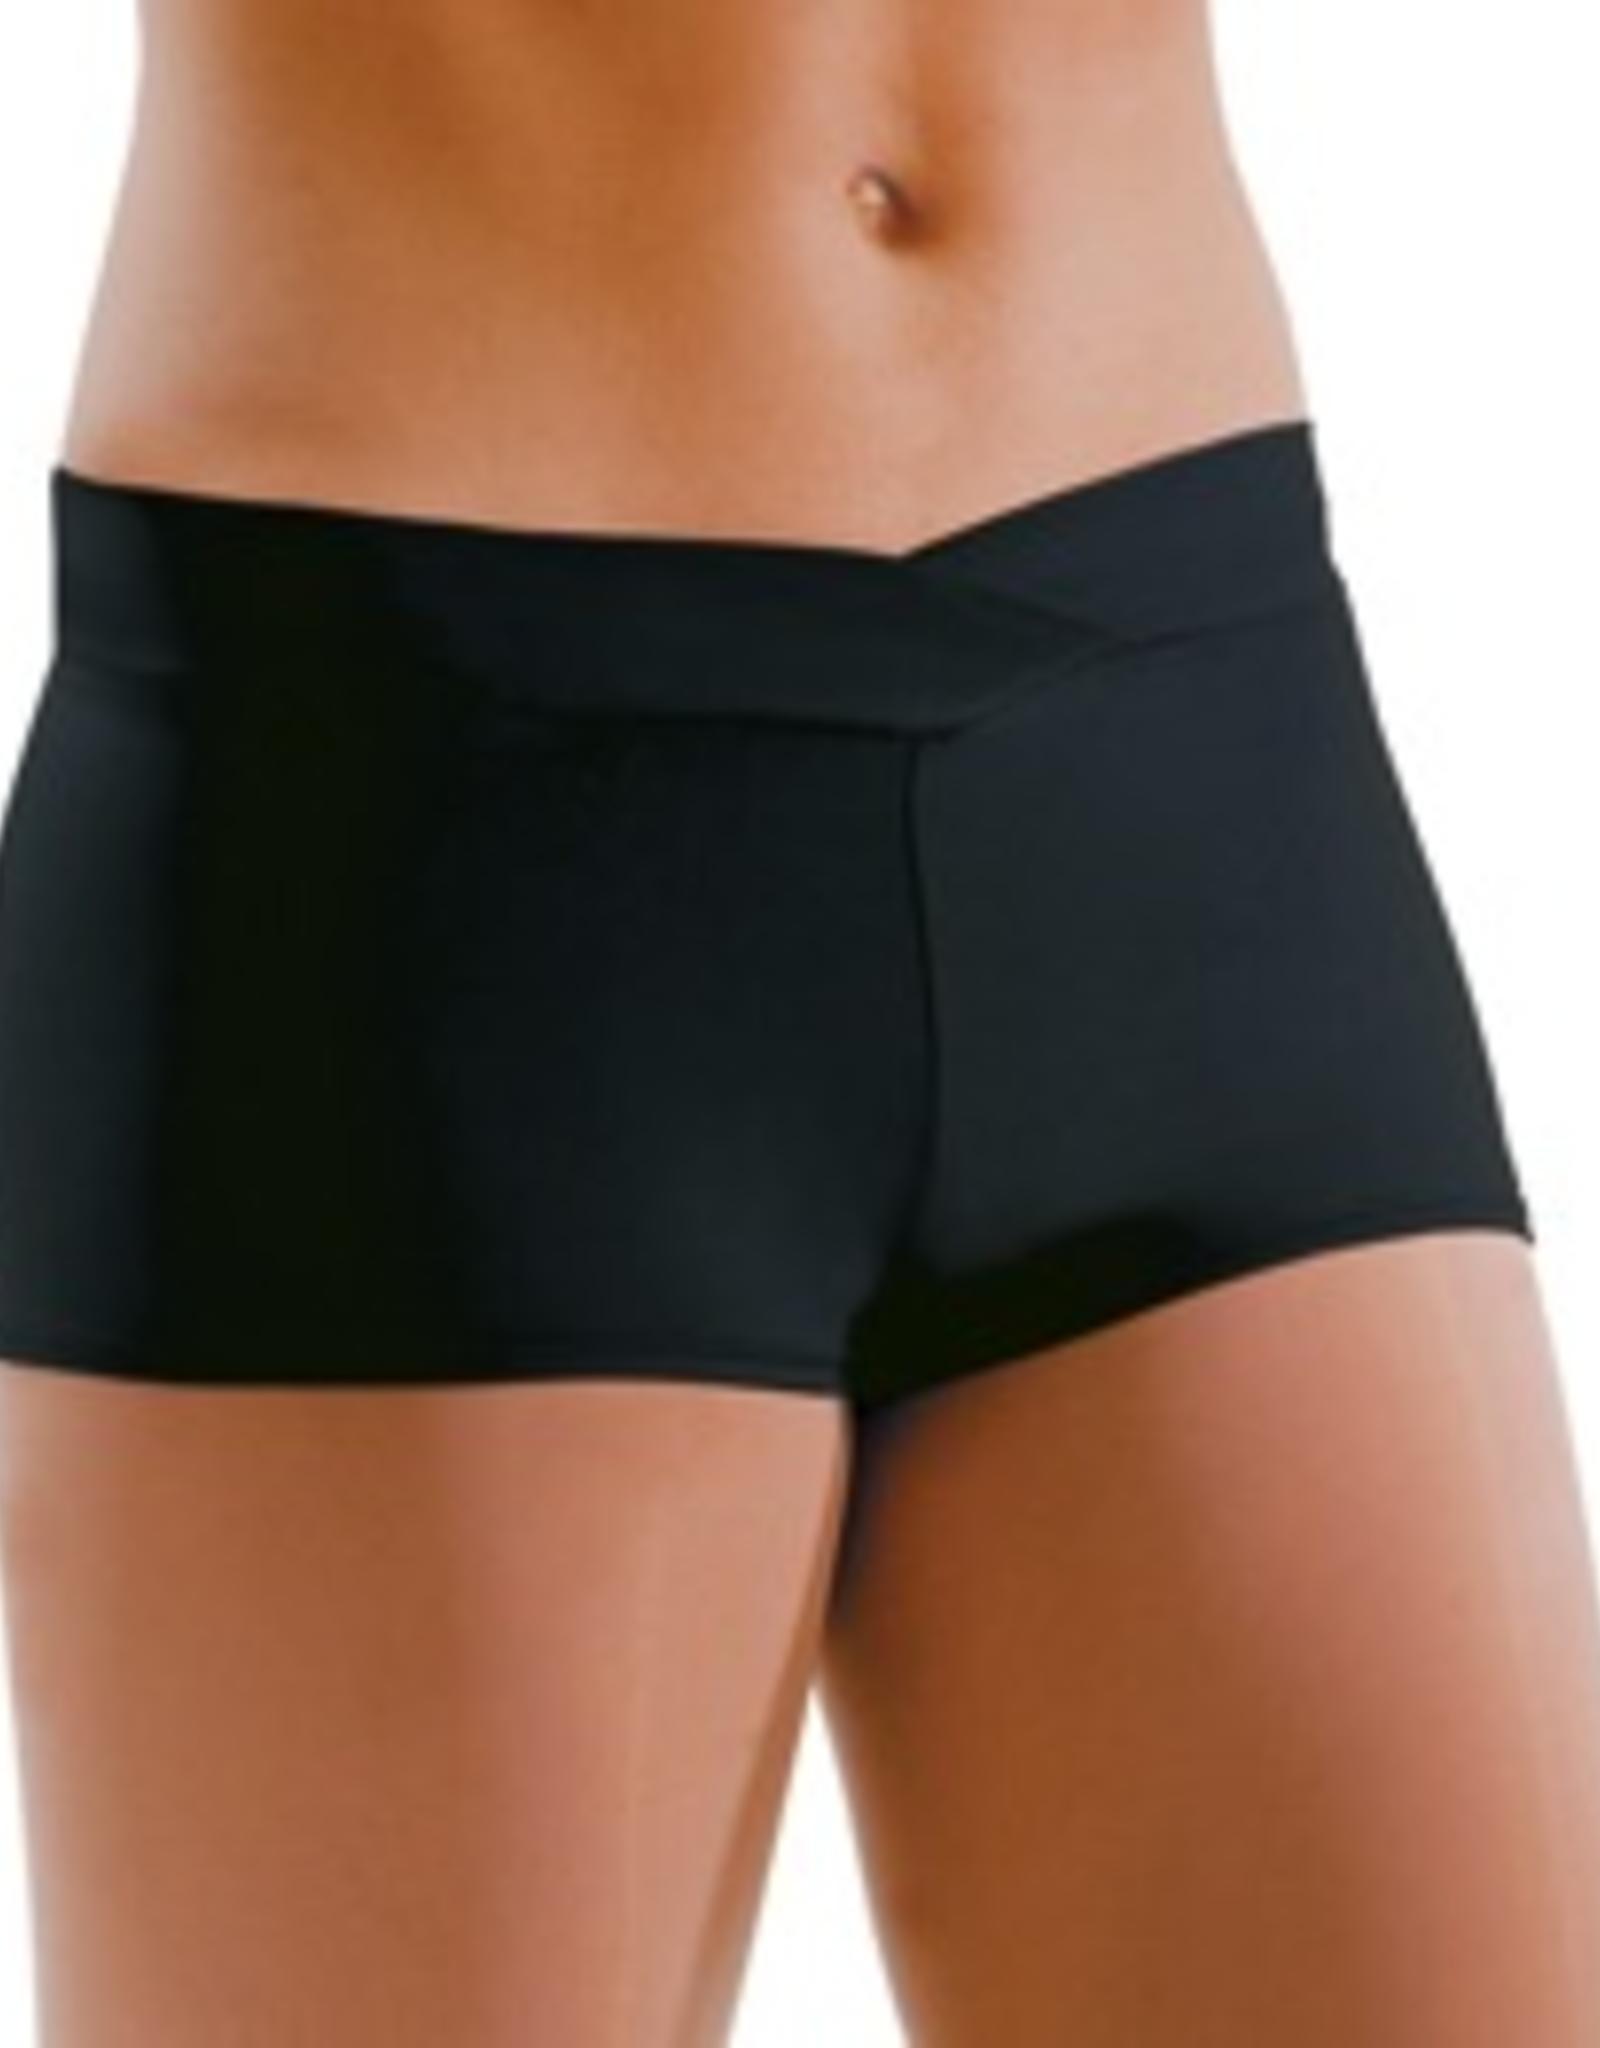 Motionwear 7121 V-Waist Shorts (1 3/4 in. Inseam) Adult